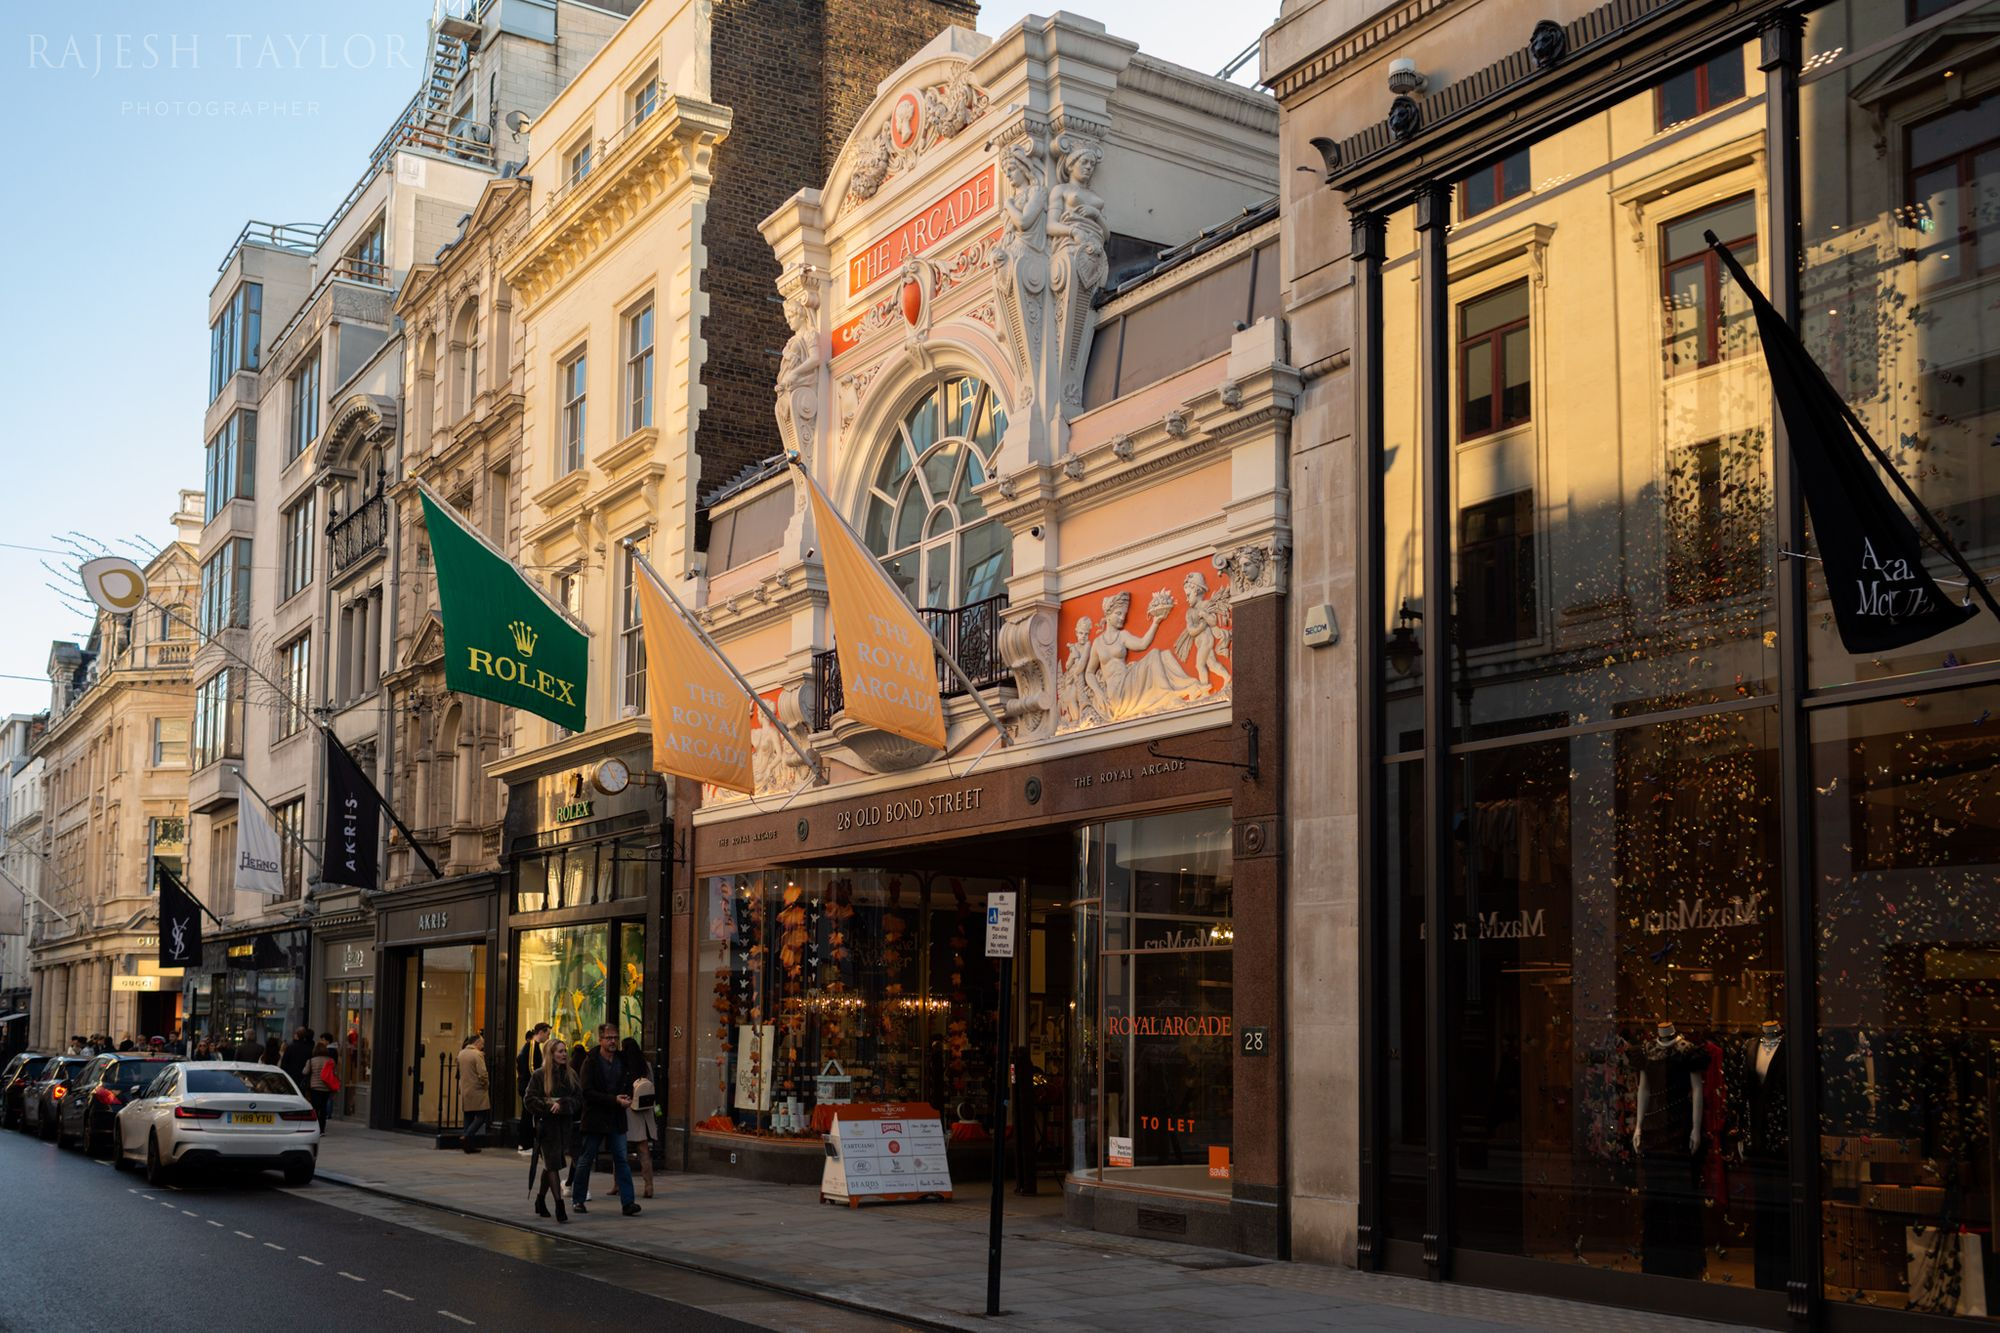 Royal Arcade on Old Bond Street, home to many former bespoke craftsmen ©Rajesh Taylor